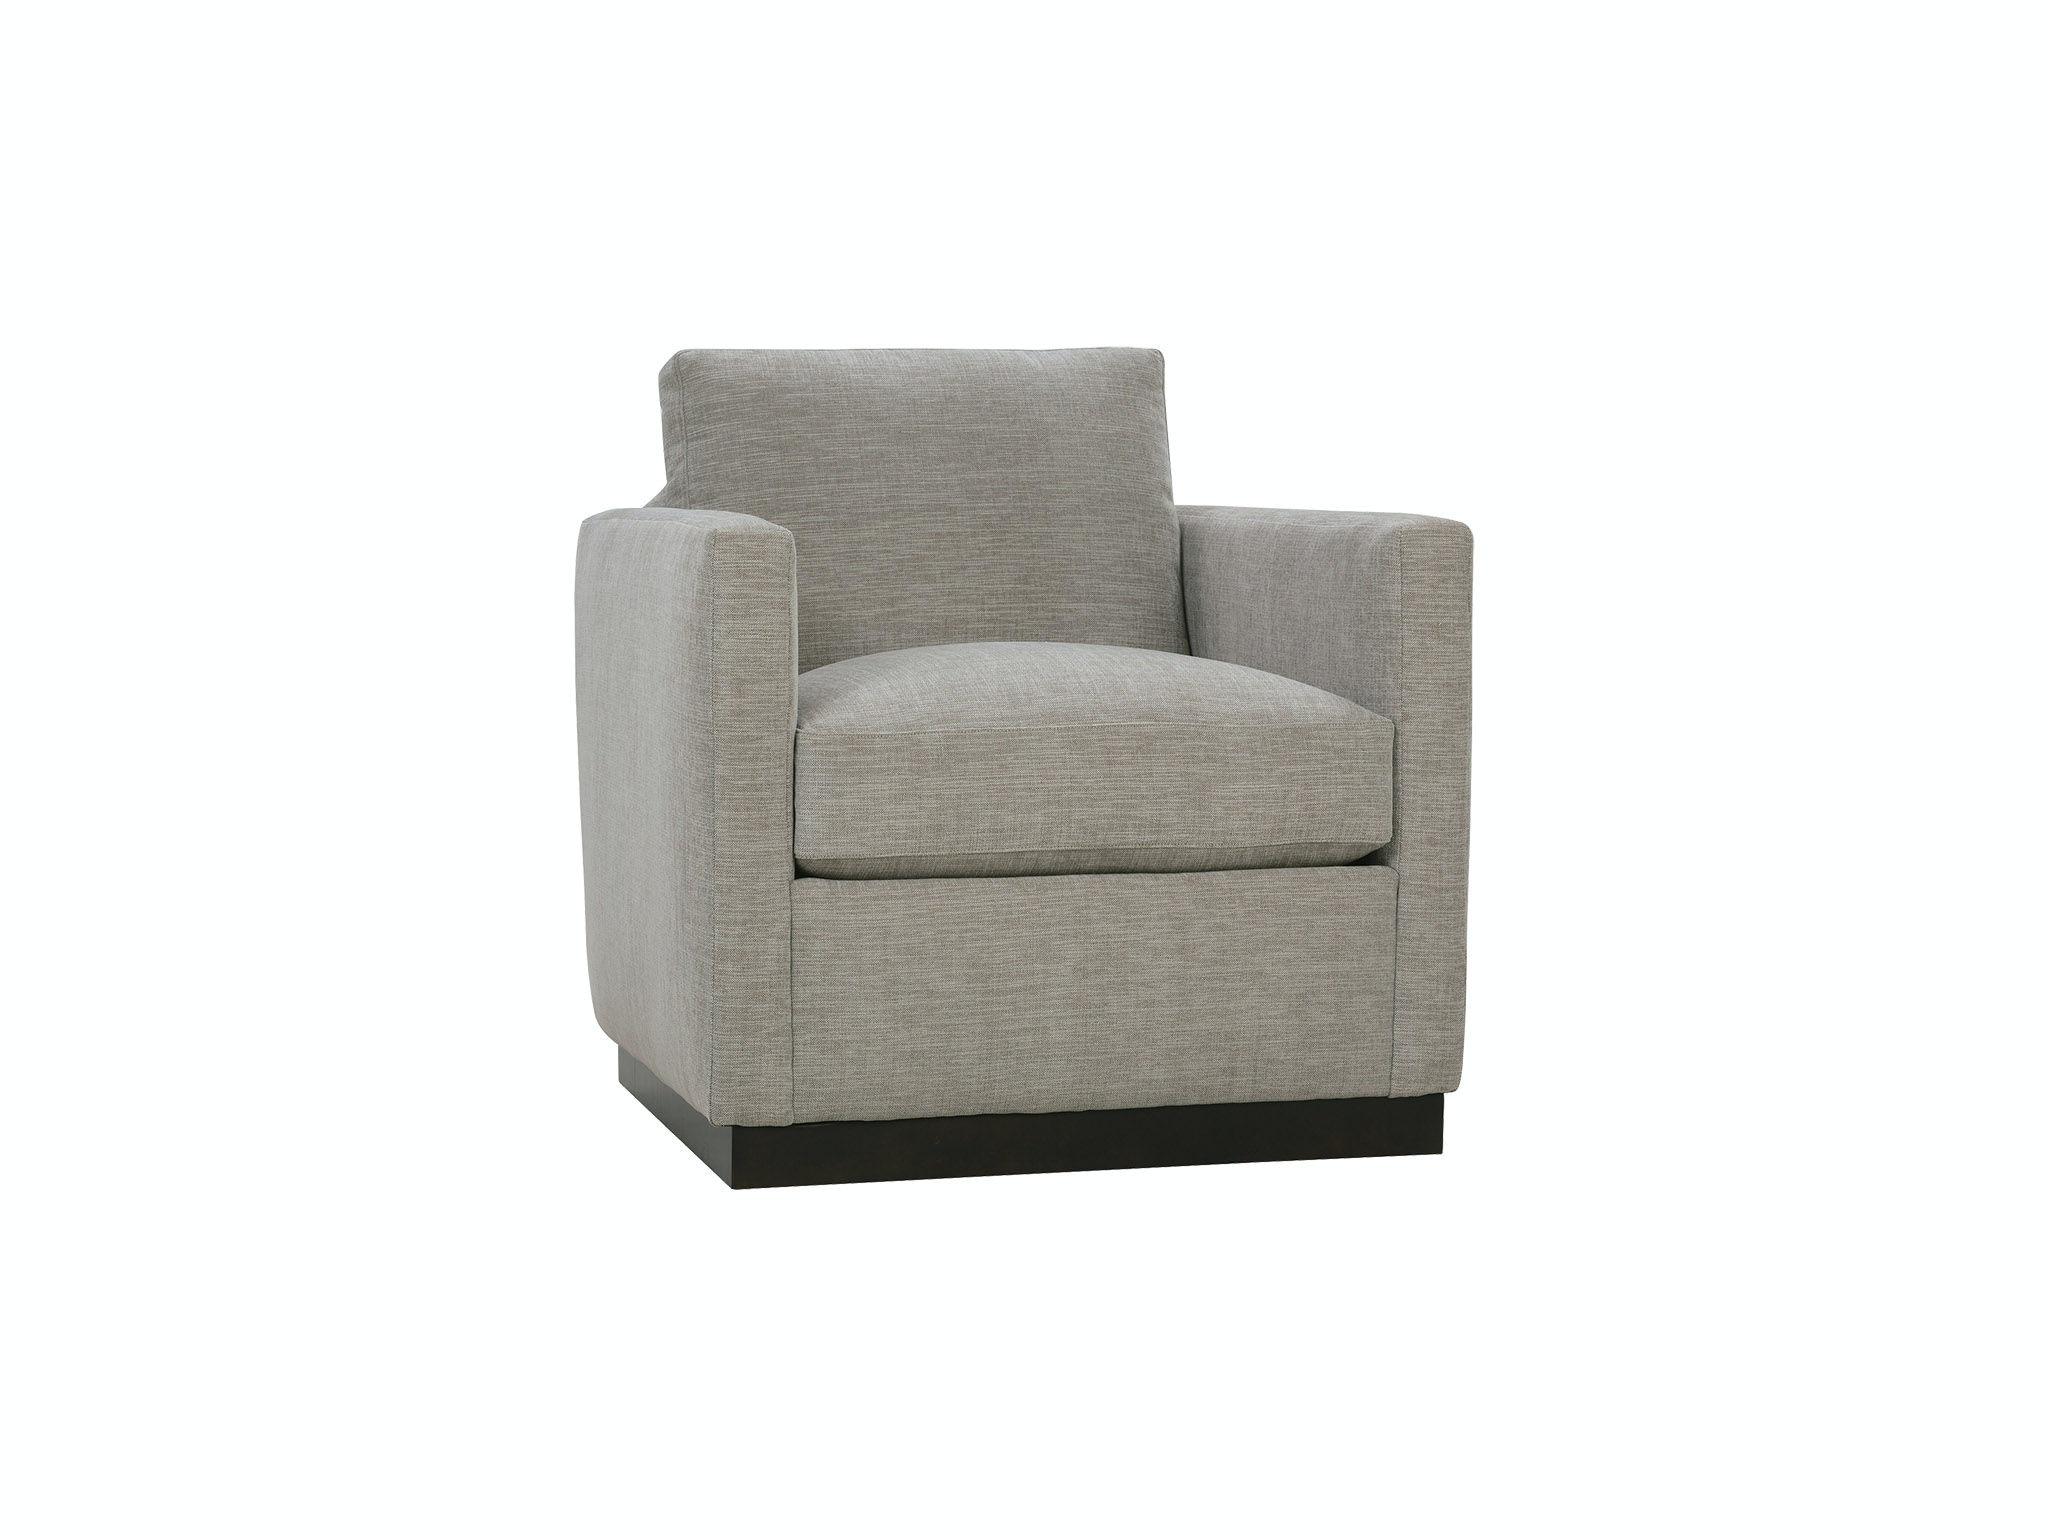 Robin Bruce Swivel Chair ALLIE 016